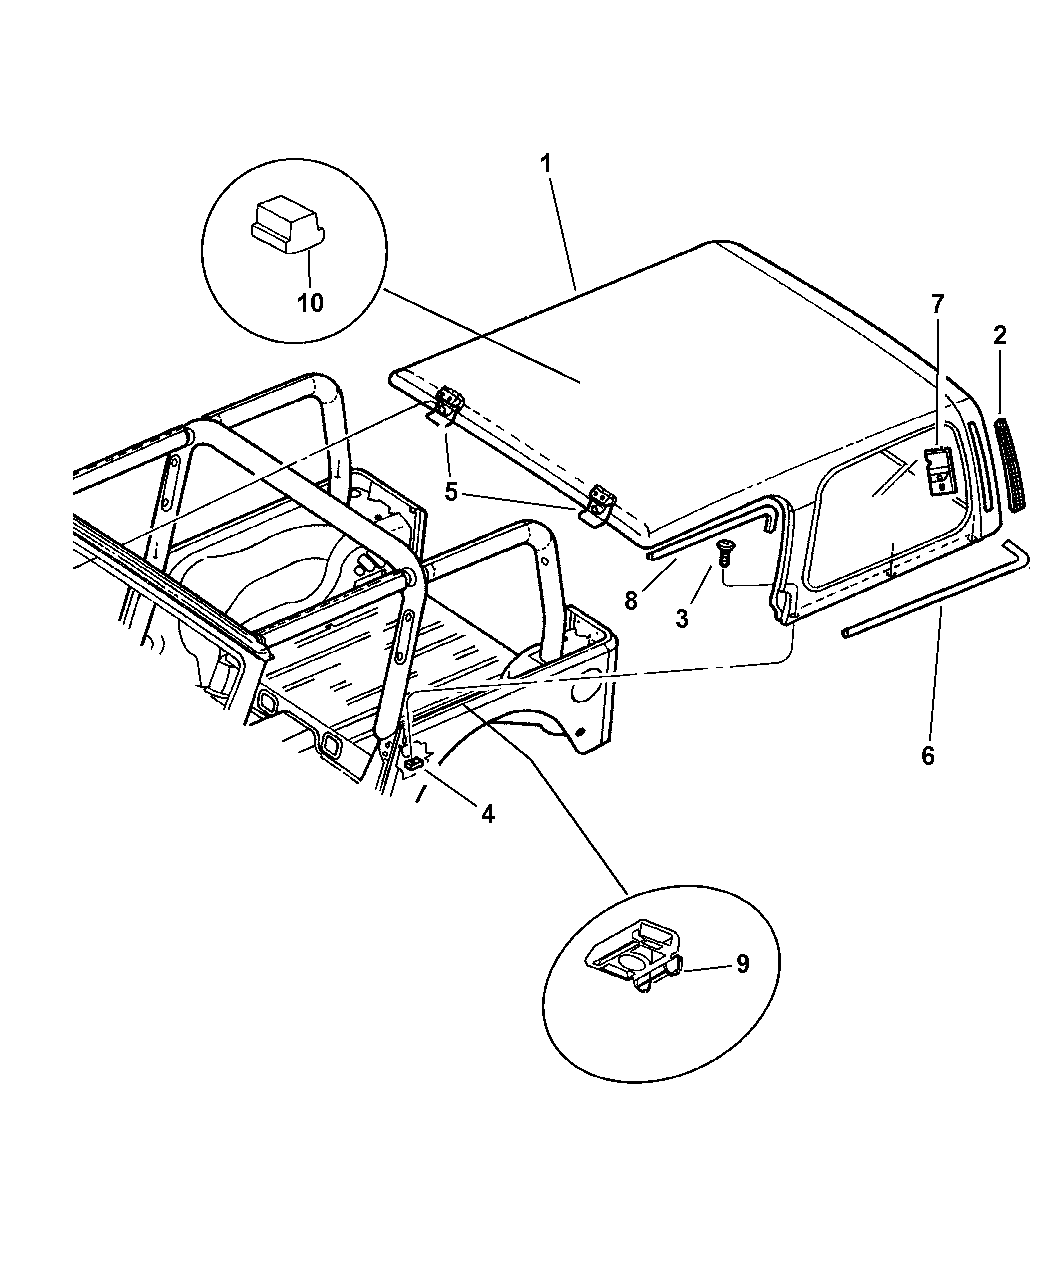 2001 JEEP WRANGLER 4 0 ENGINE DIAGRAM - Auto Electrical ...